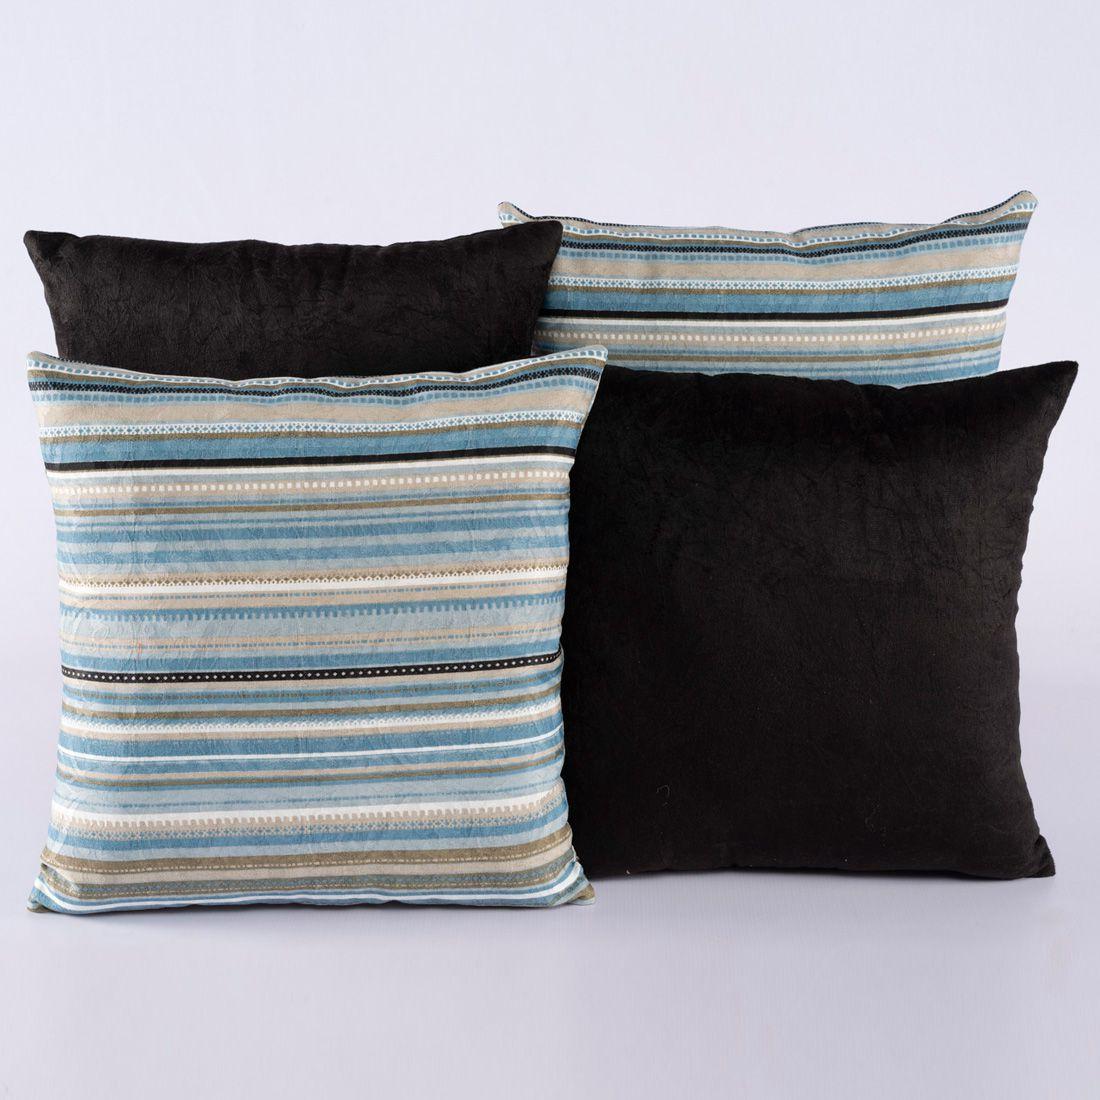 Kit c/ 4 Almofadas Cheias Decorativas Preto/Azul Listrado